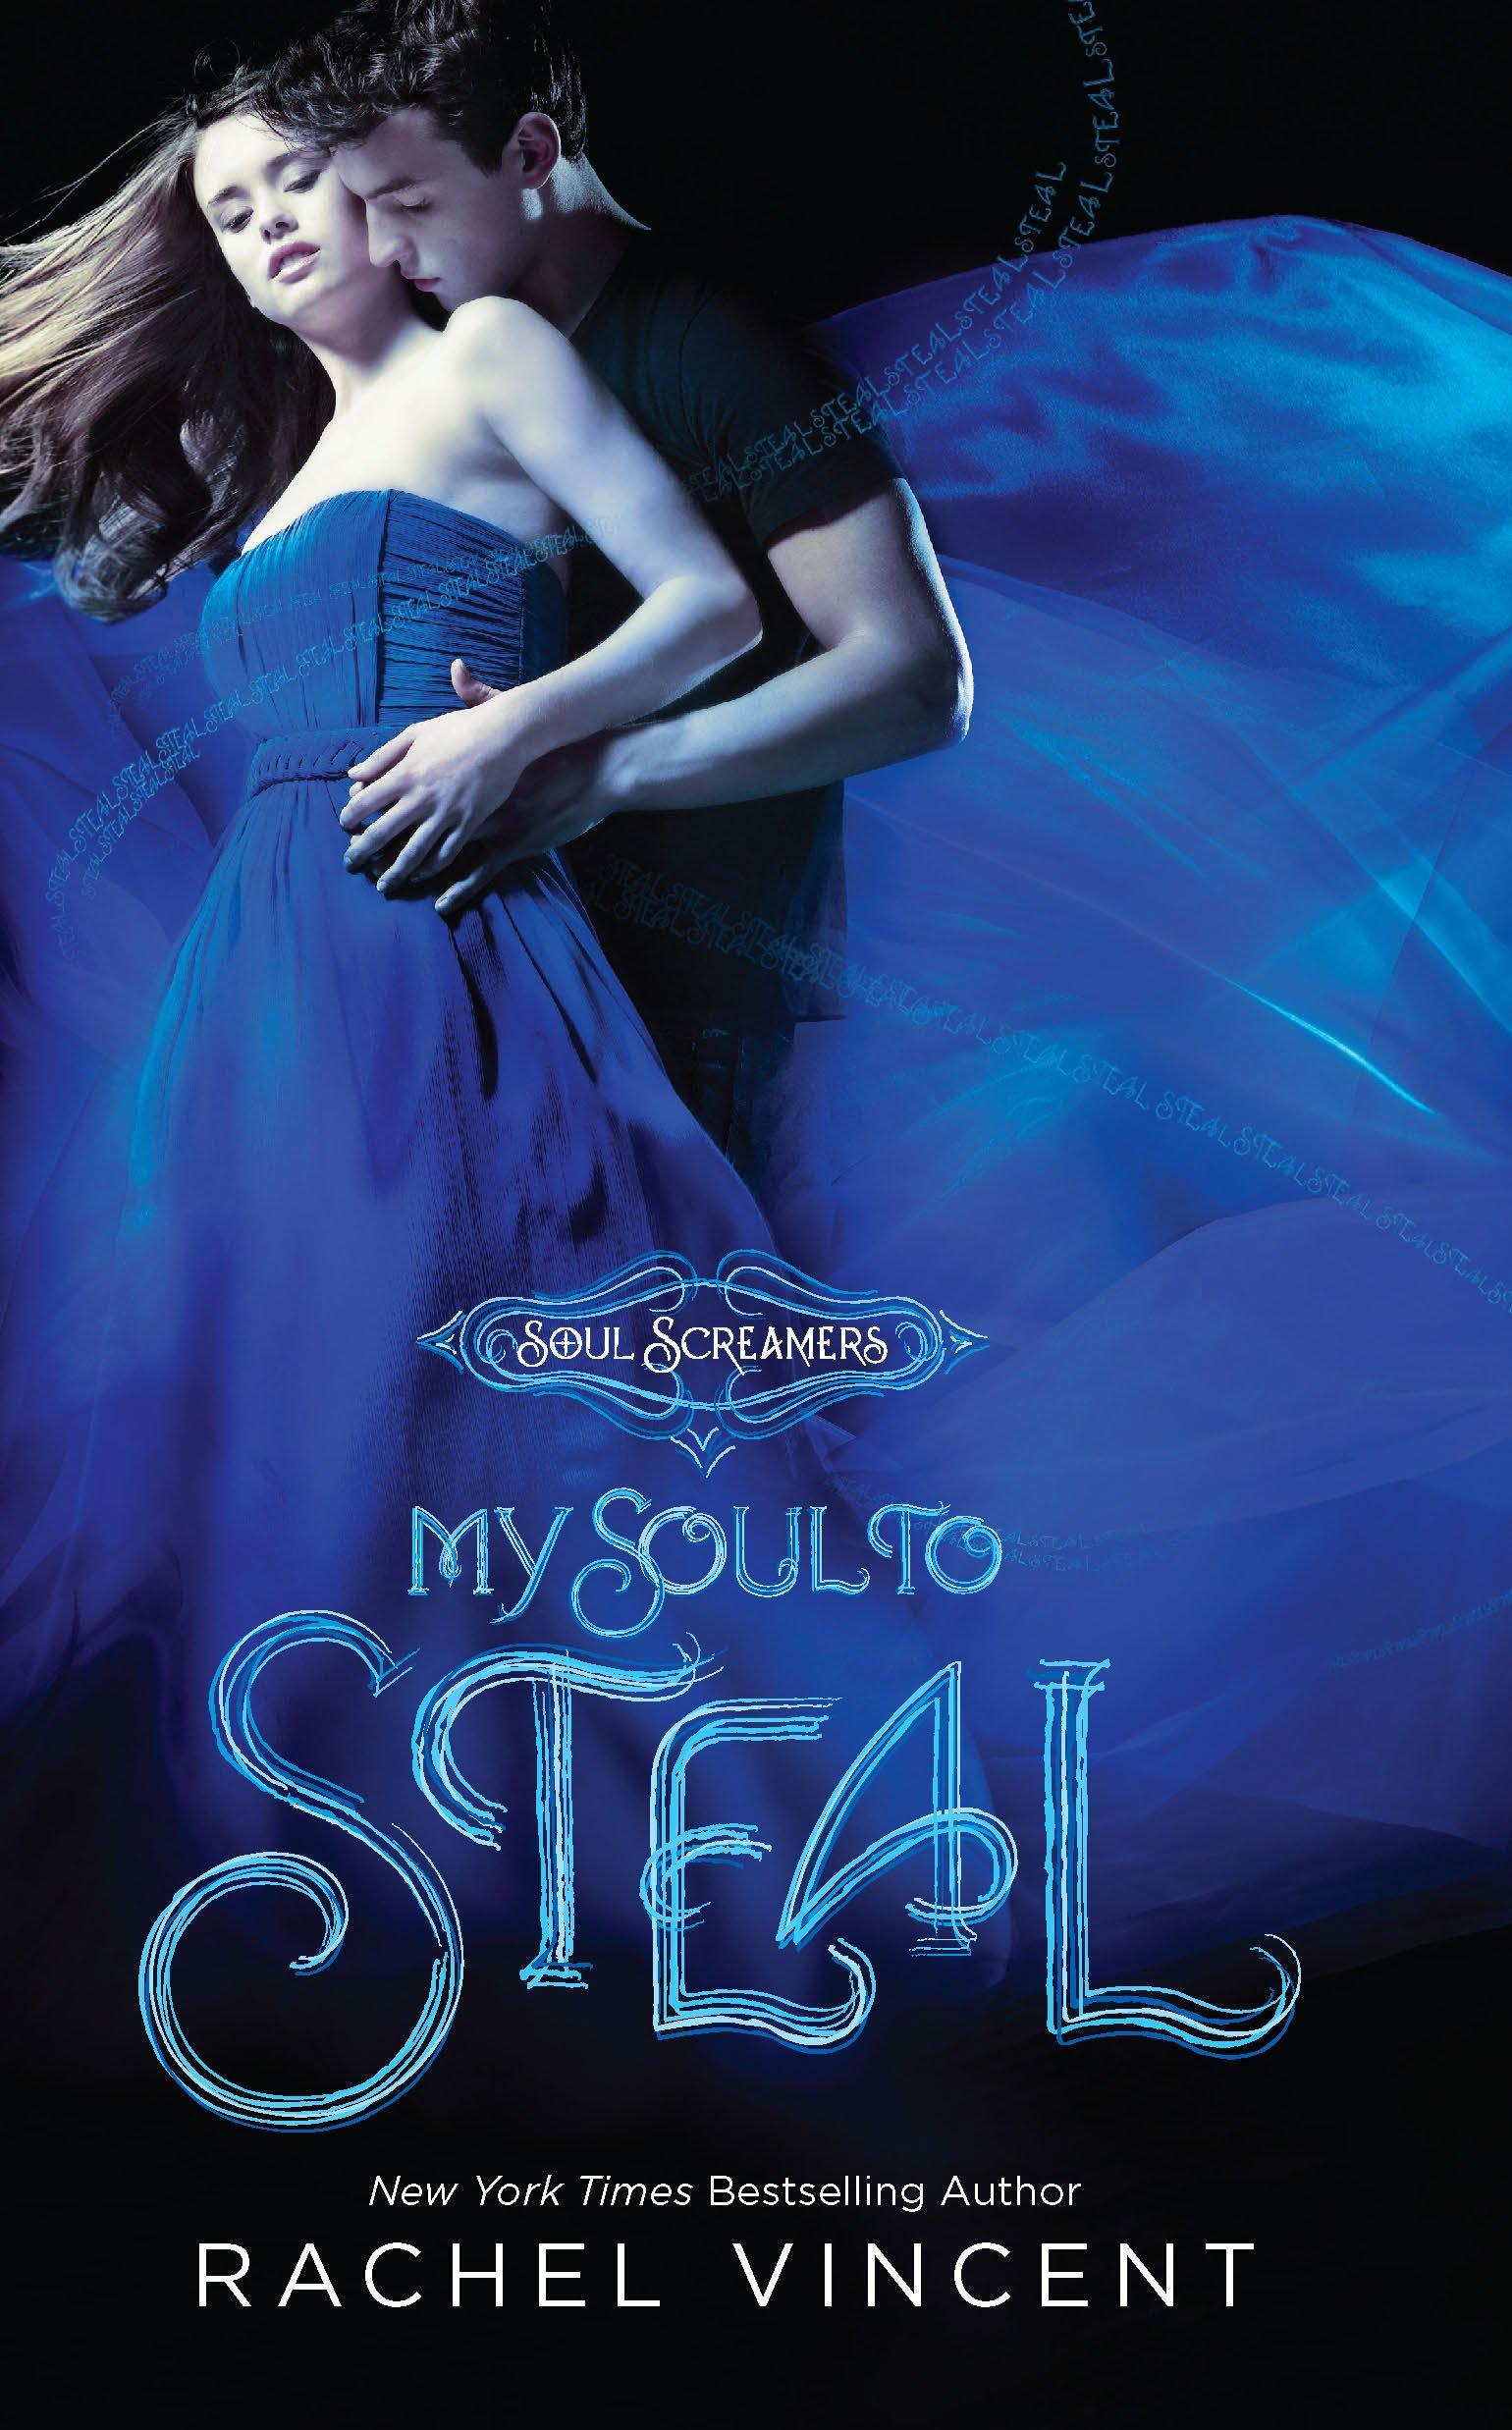 Amazon.com: My Soul to Steal (Soul Screamers, Book 4) (9780373210275):  Rachel Vincent: Books